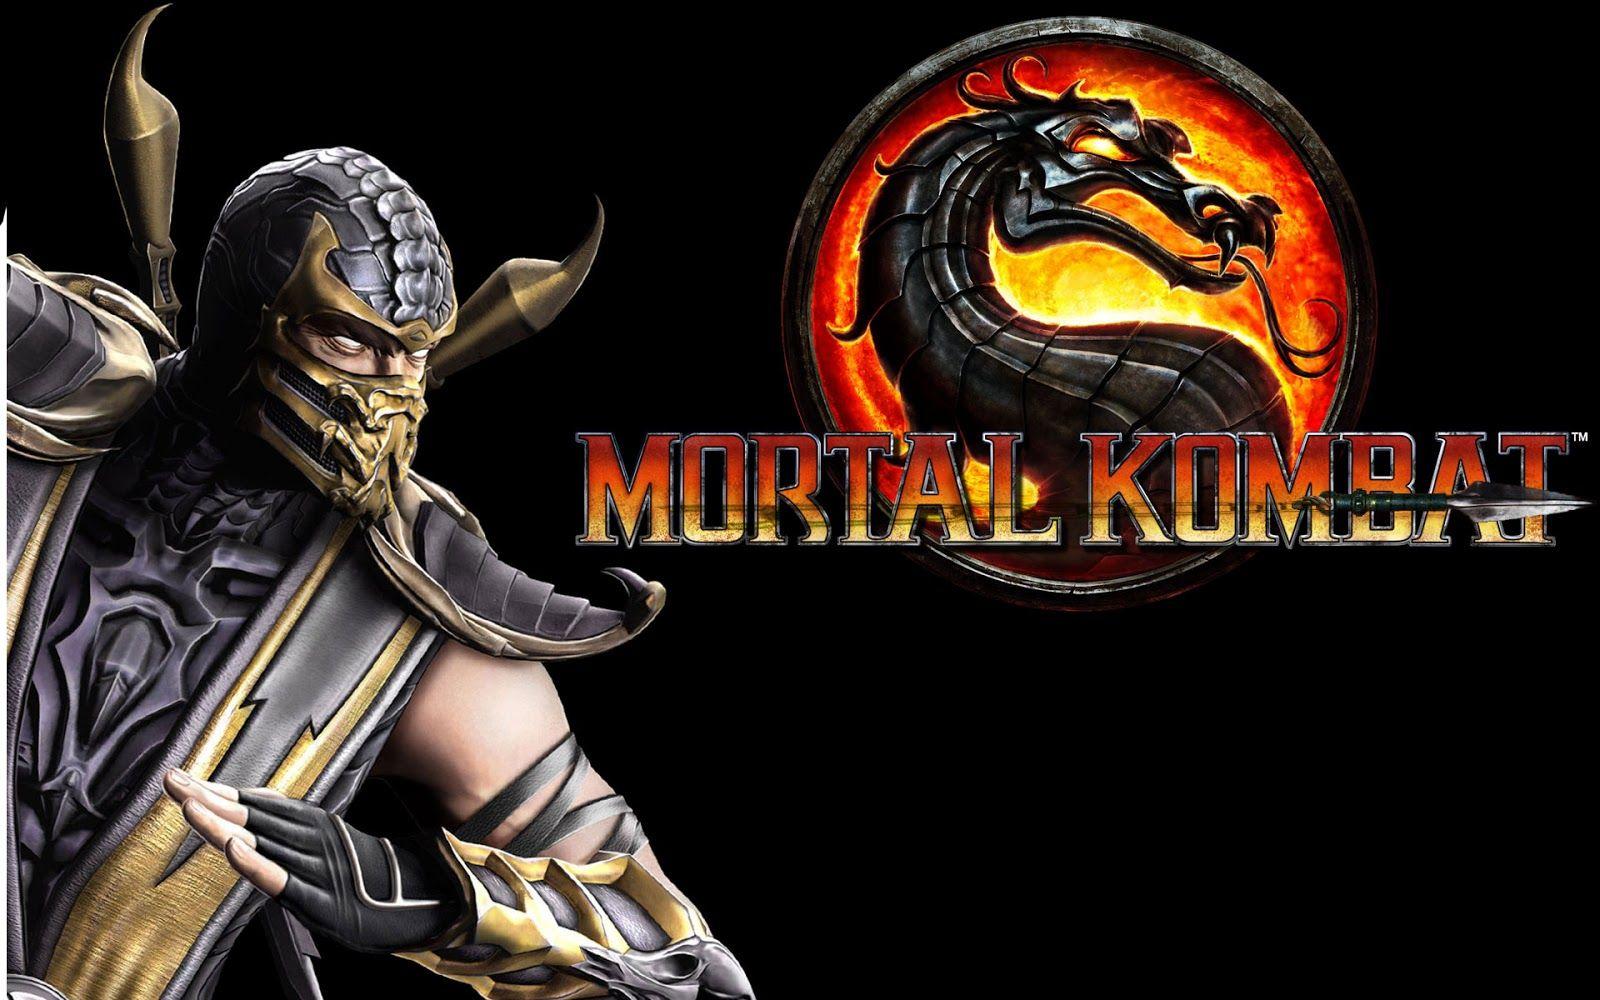 Mortal-kombat-Games-2013-Wallpaper.jpg (1600×1000)